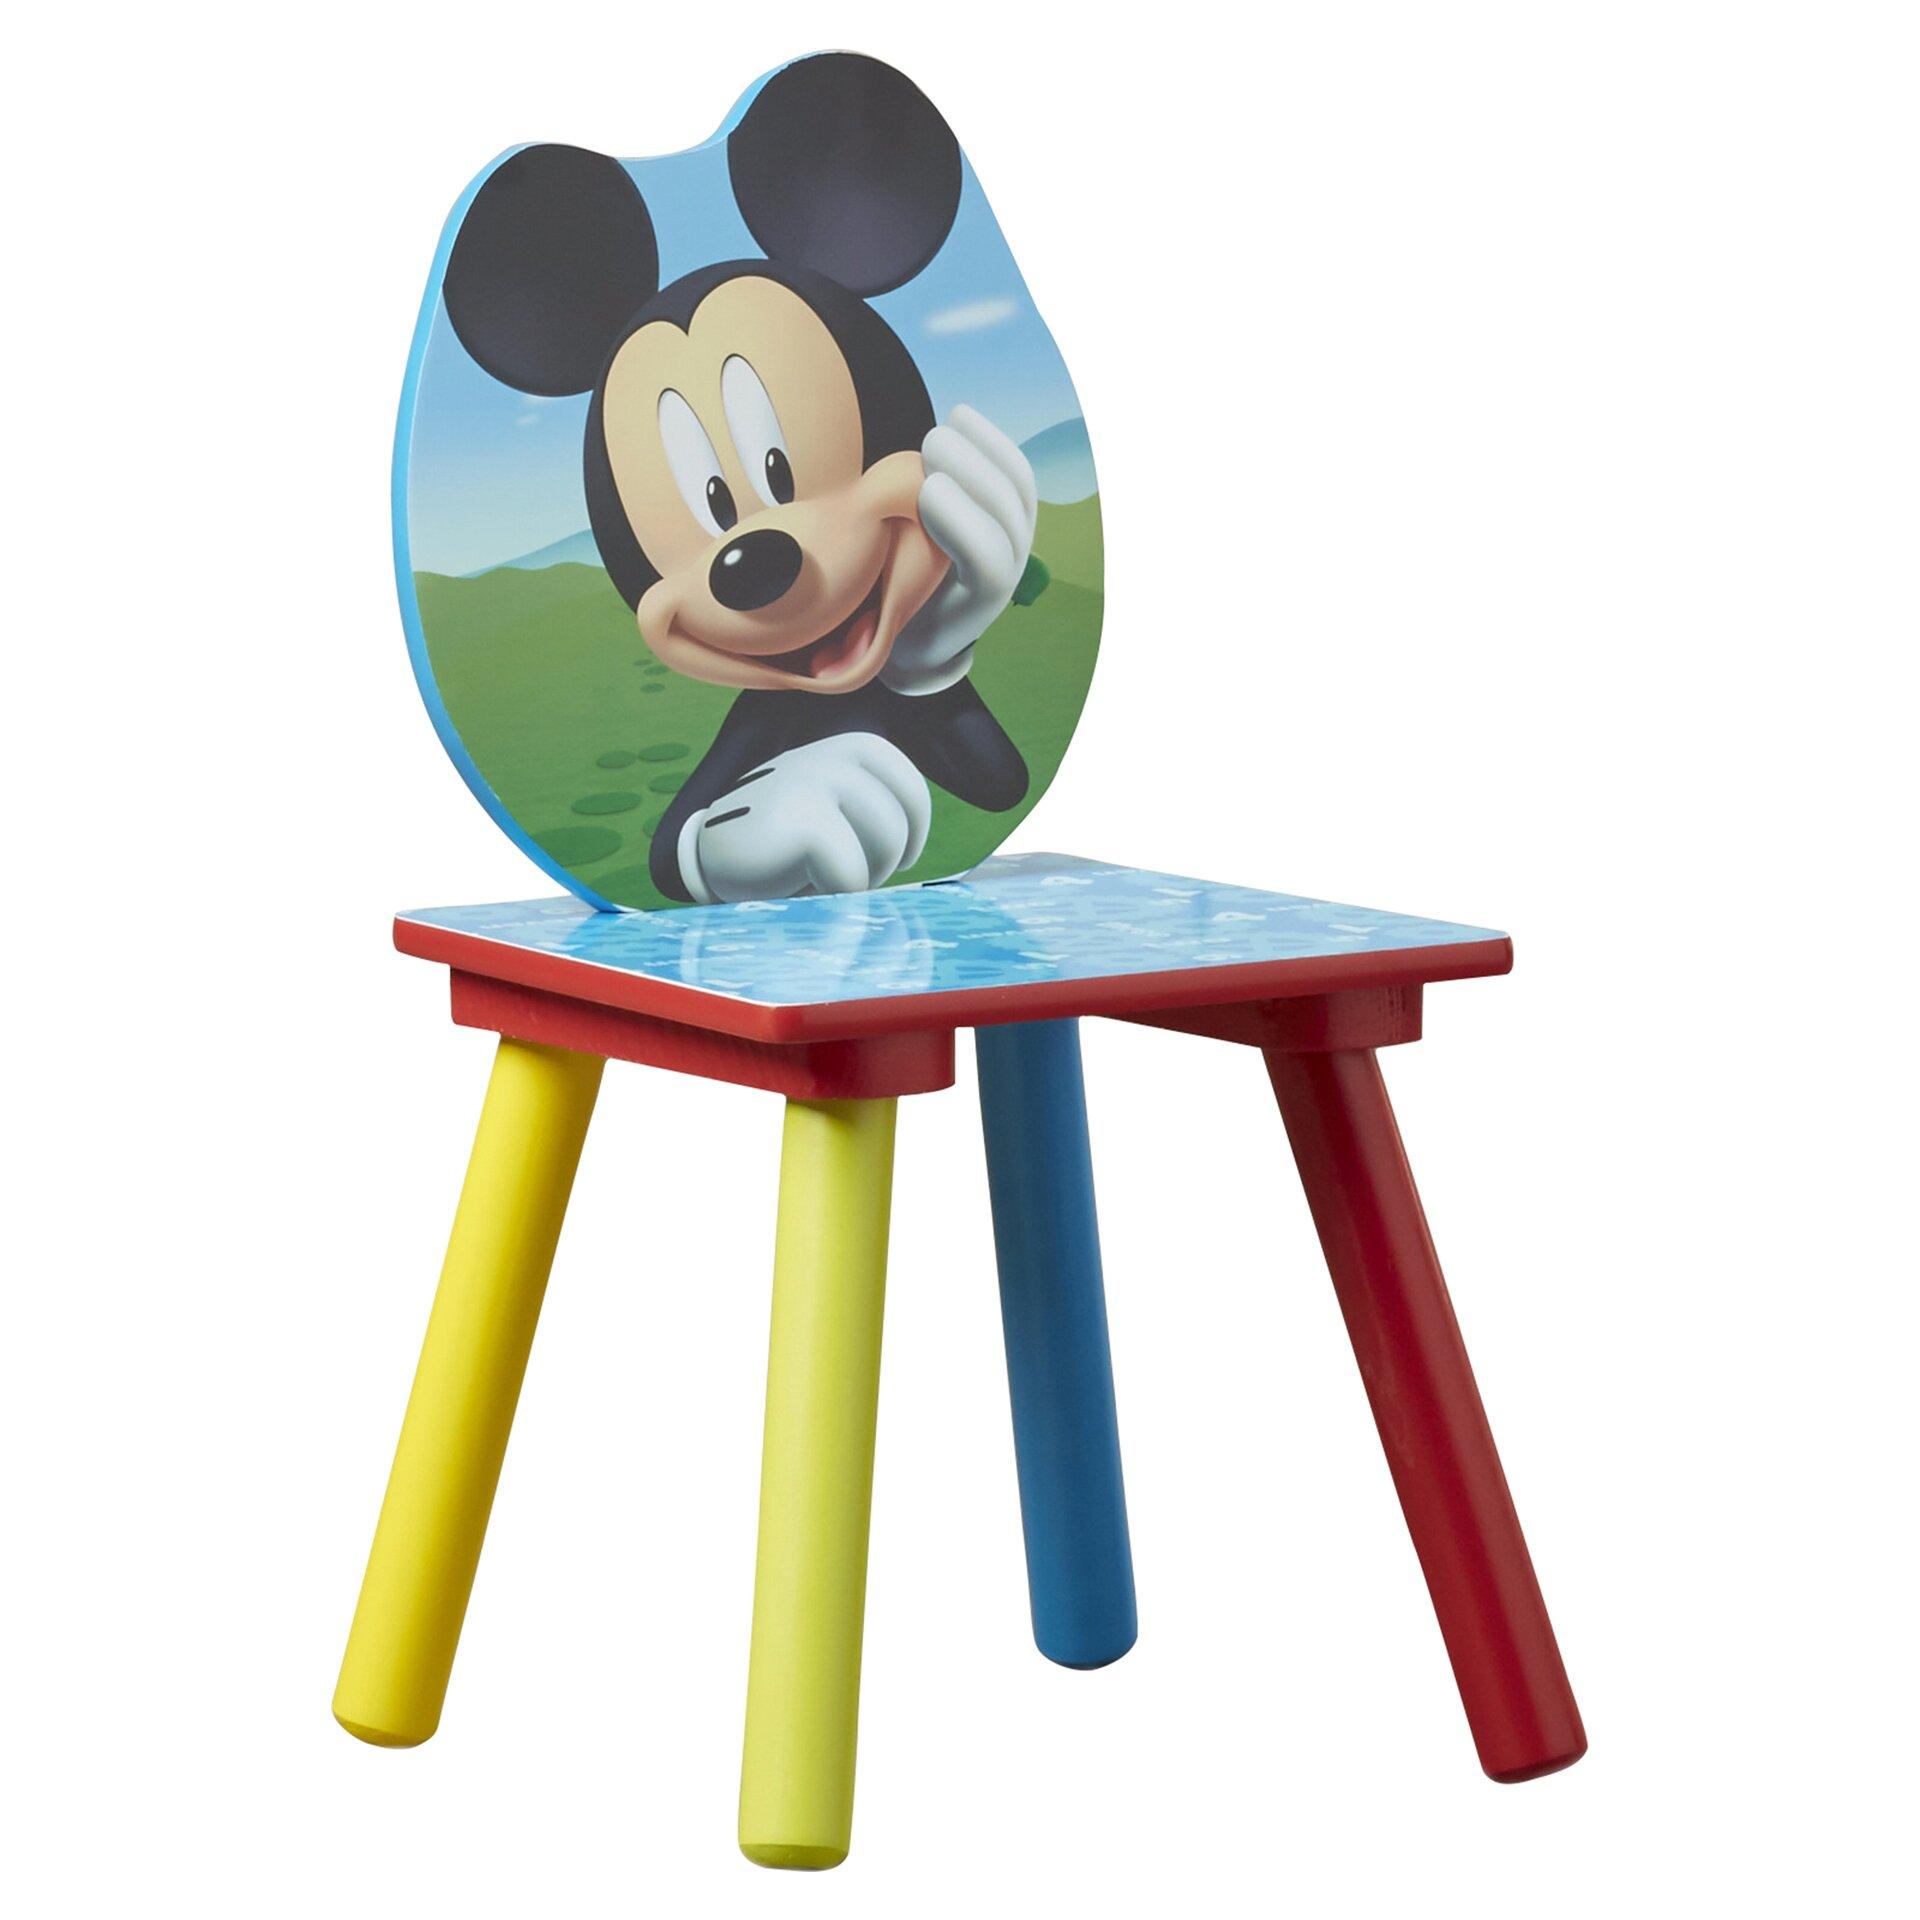 Mickey Mouse Patio Set Crunchymustard